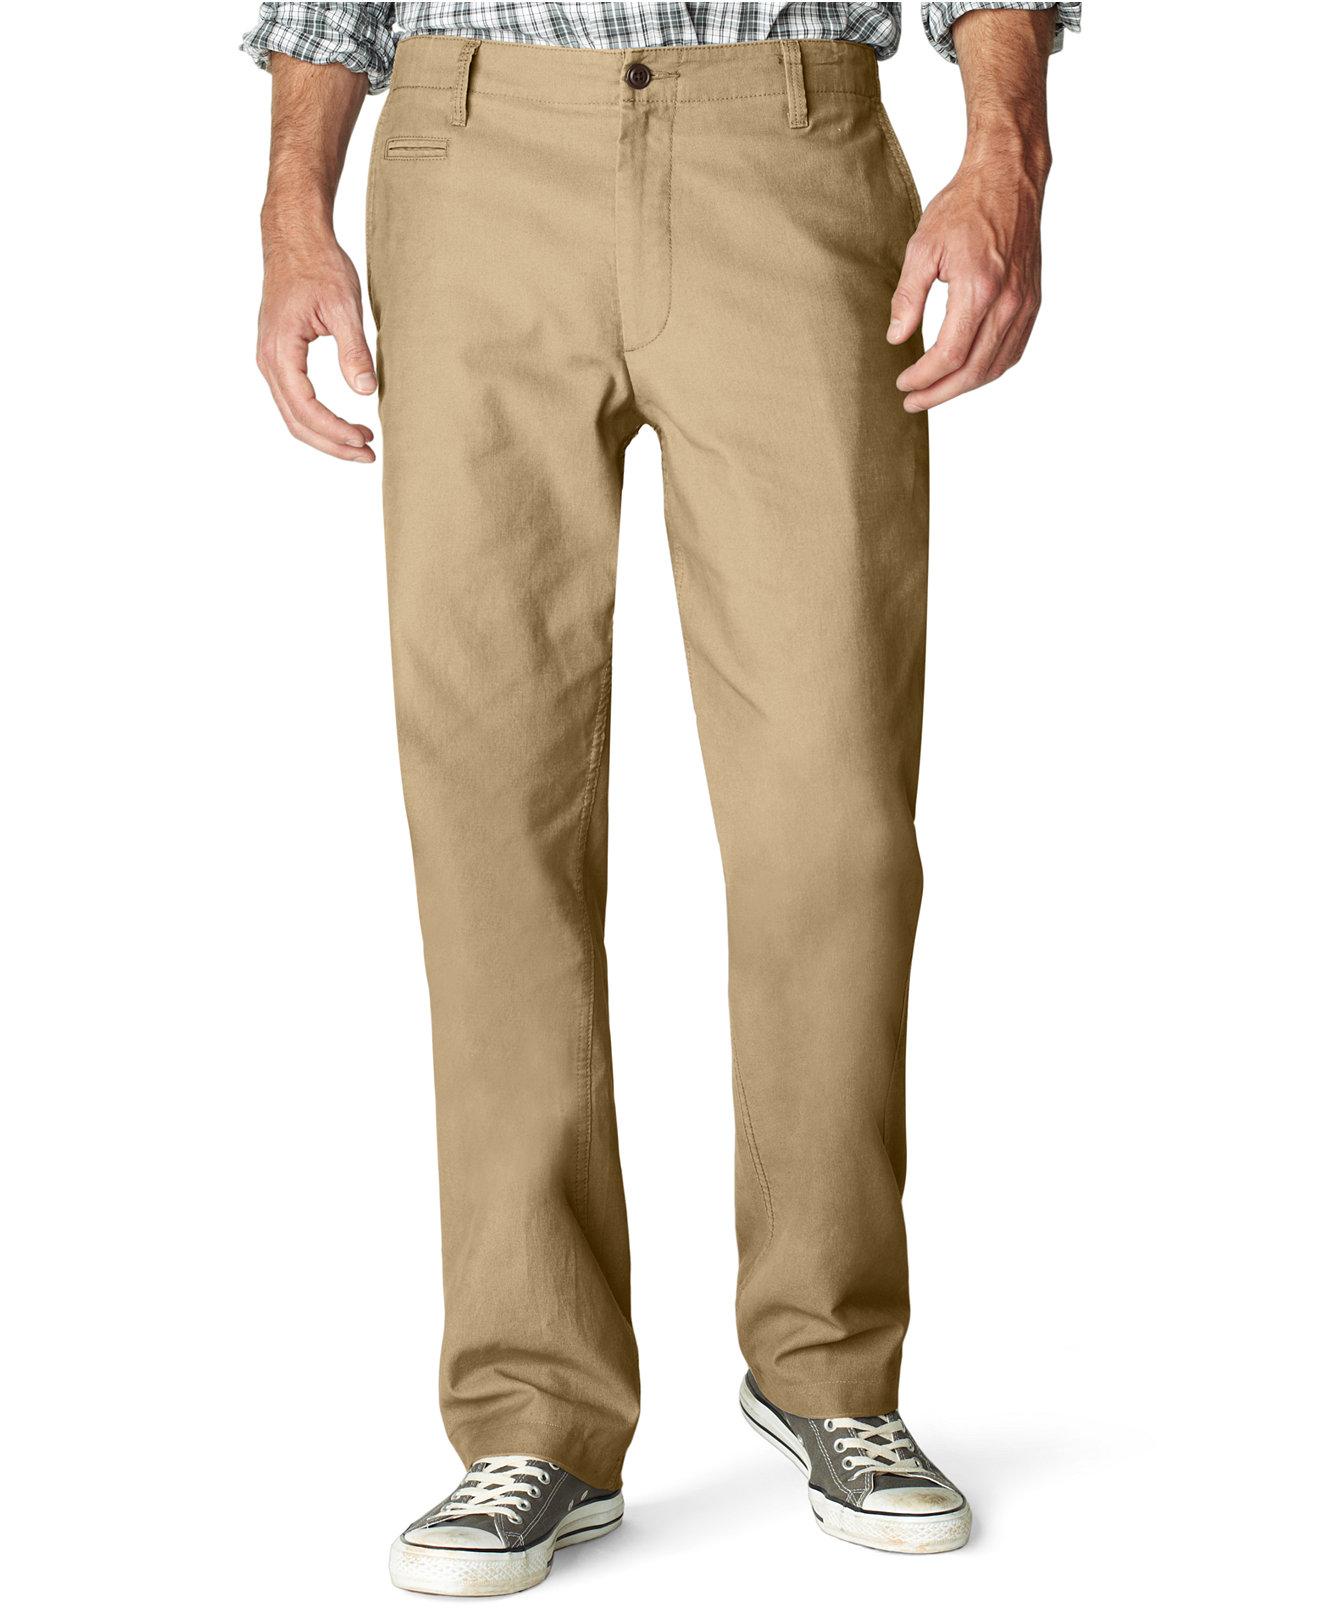 Shop Online Mens Clothes